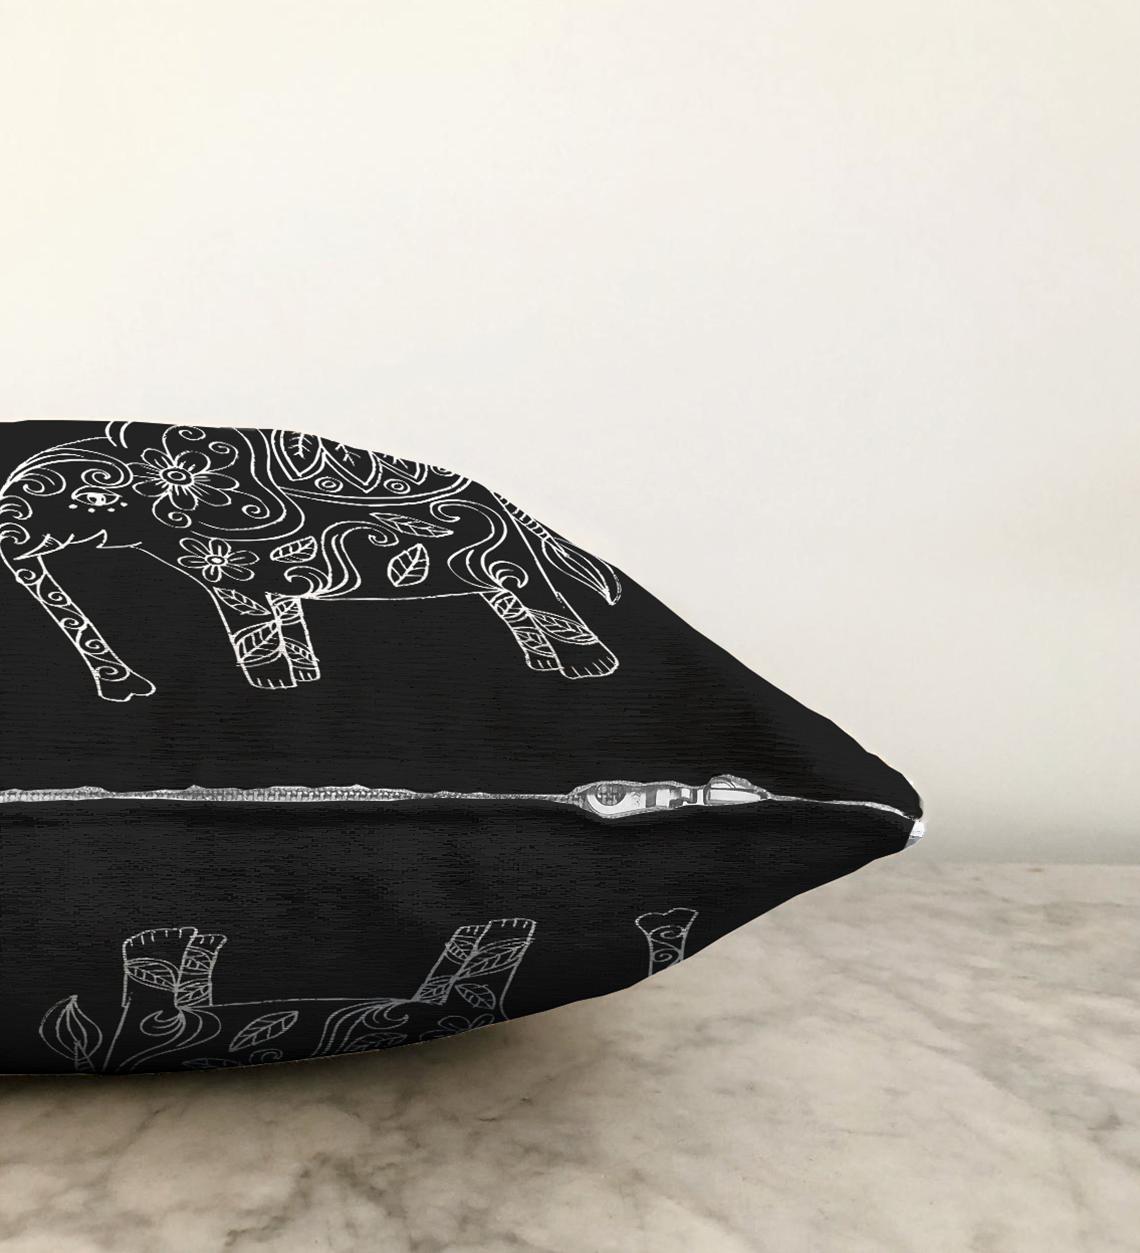 Çift Taraflı Retro Mandala Fil Desenli Özel Tasarım Şönil Kırlent Kılıfı - 55 x 55 cm Realhomes